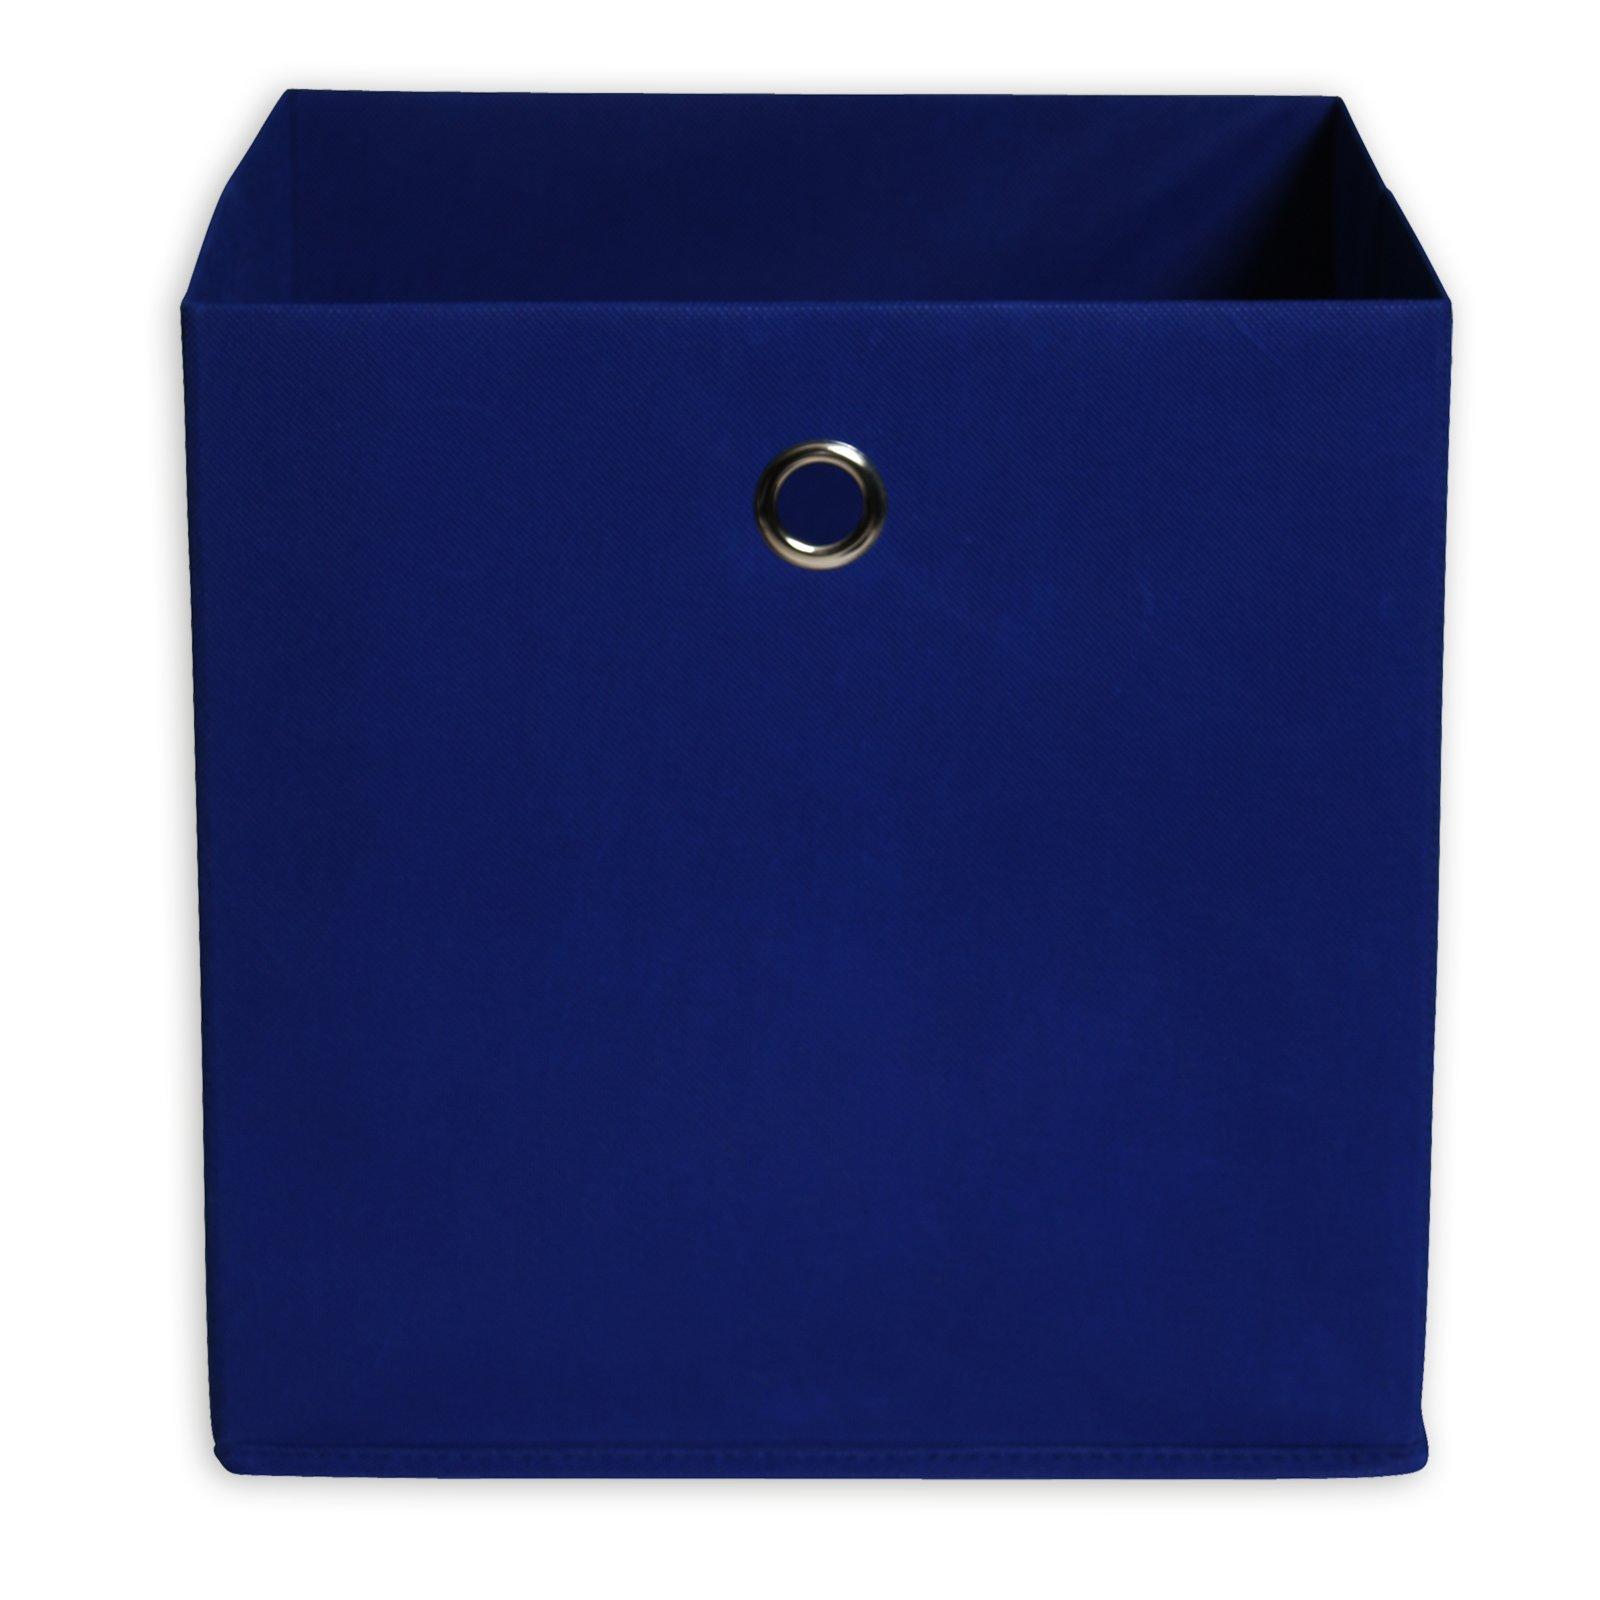 Faltbox - blau - mit Metallöse - 32x32 cm